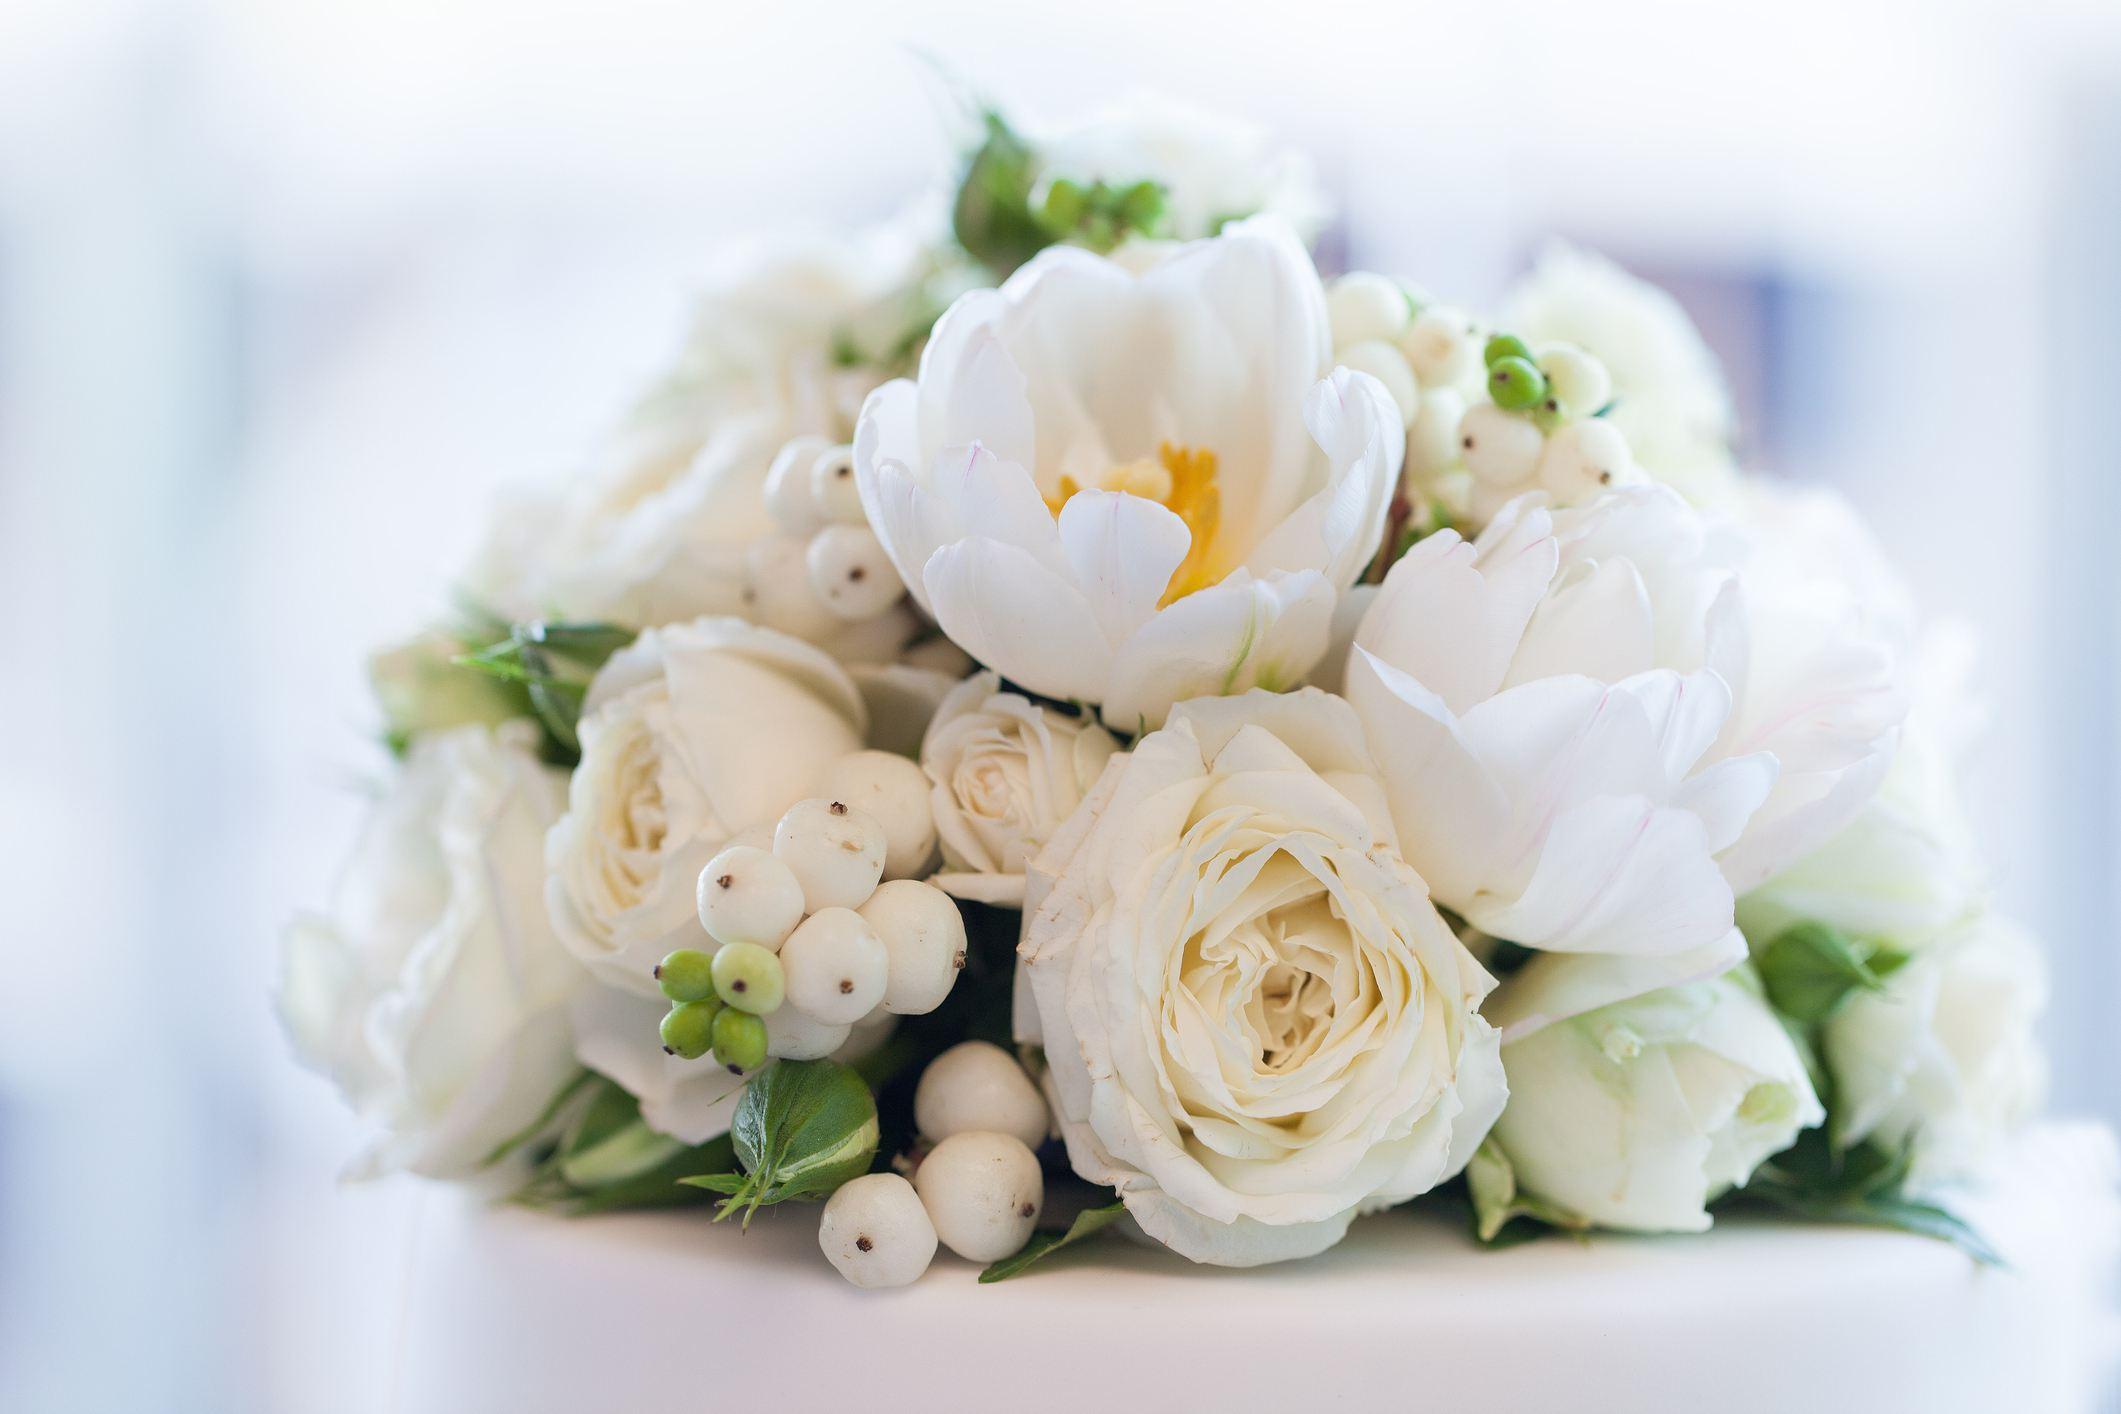 Ramo de novia blanco con bayas